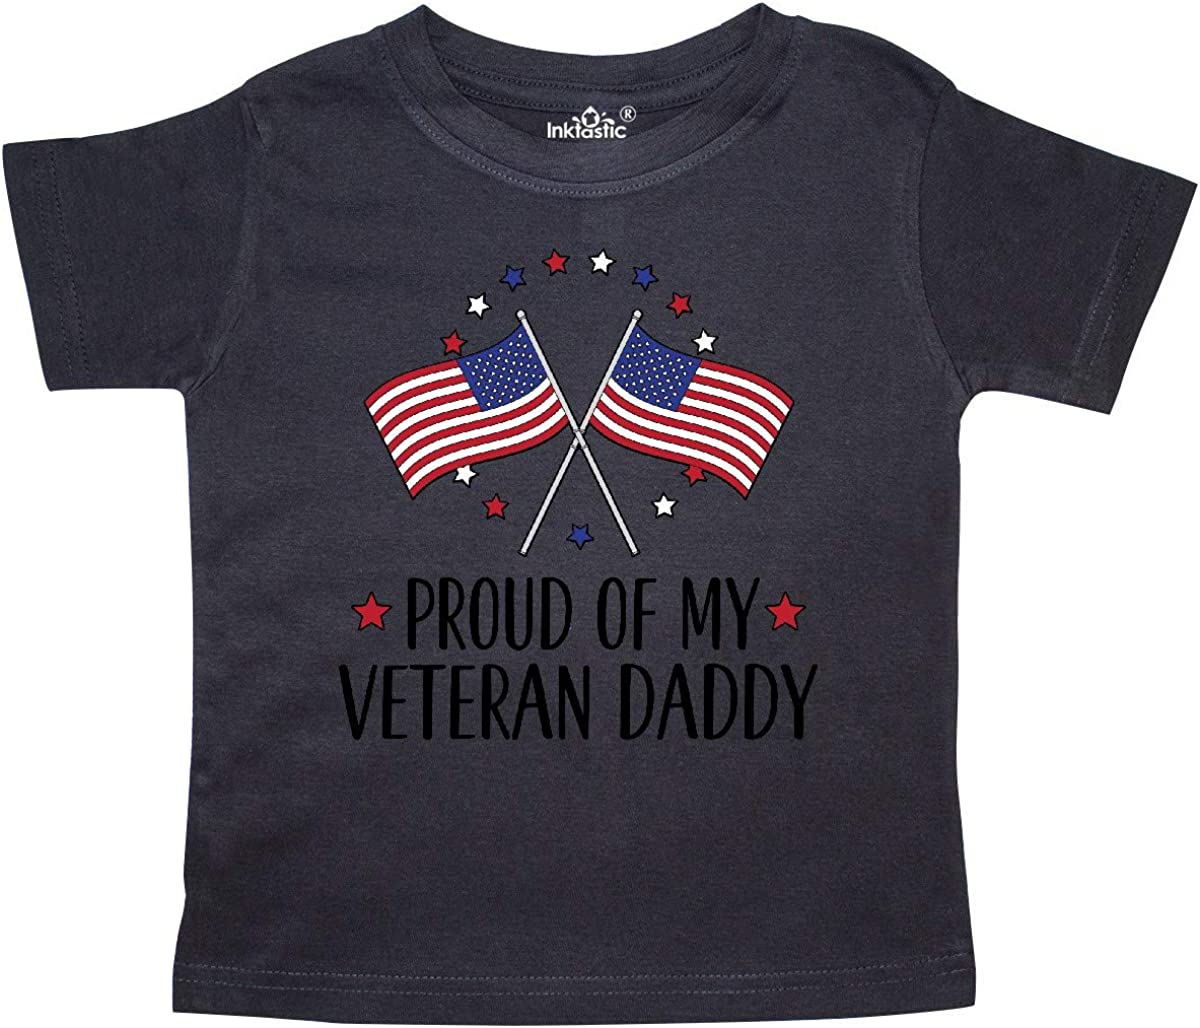 inktastic Military Veteran Daddy Proud Son Daughter Toddler T-Shirt